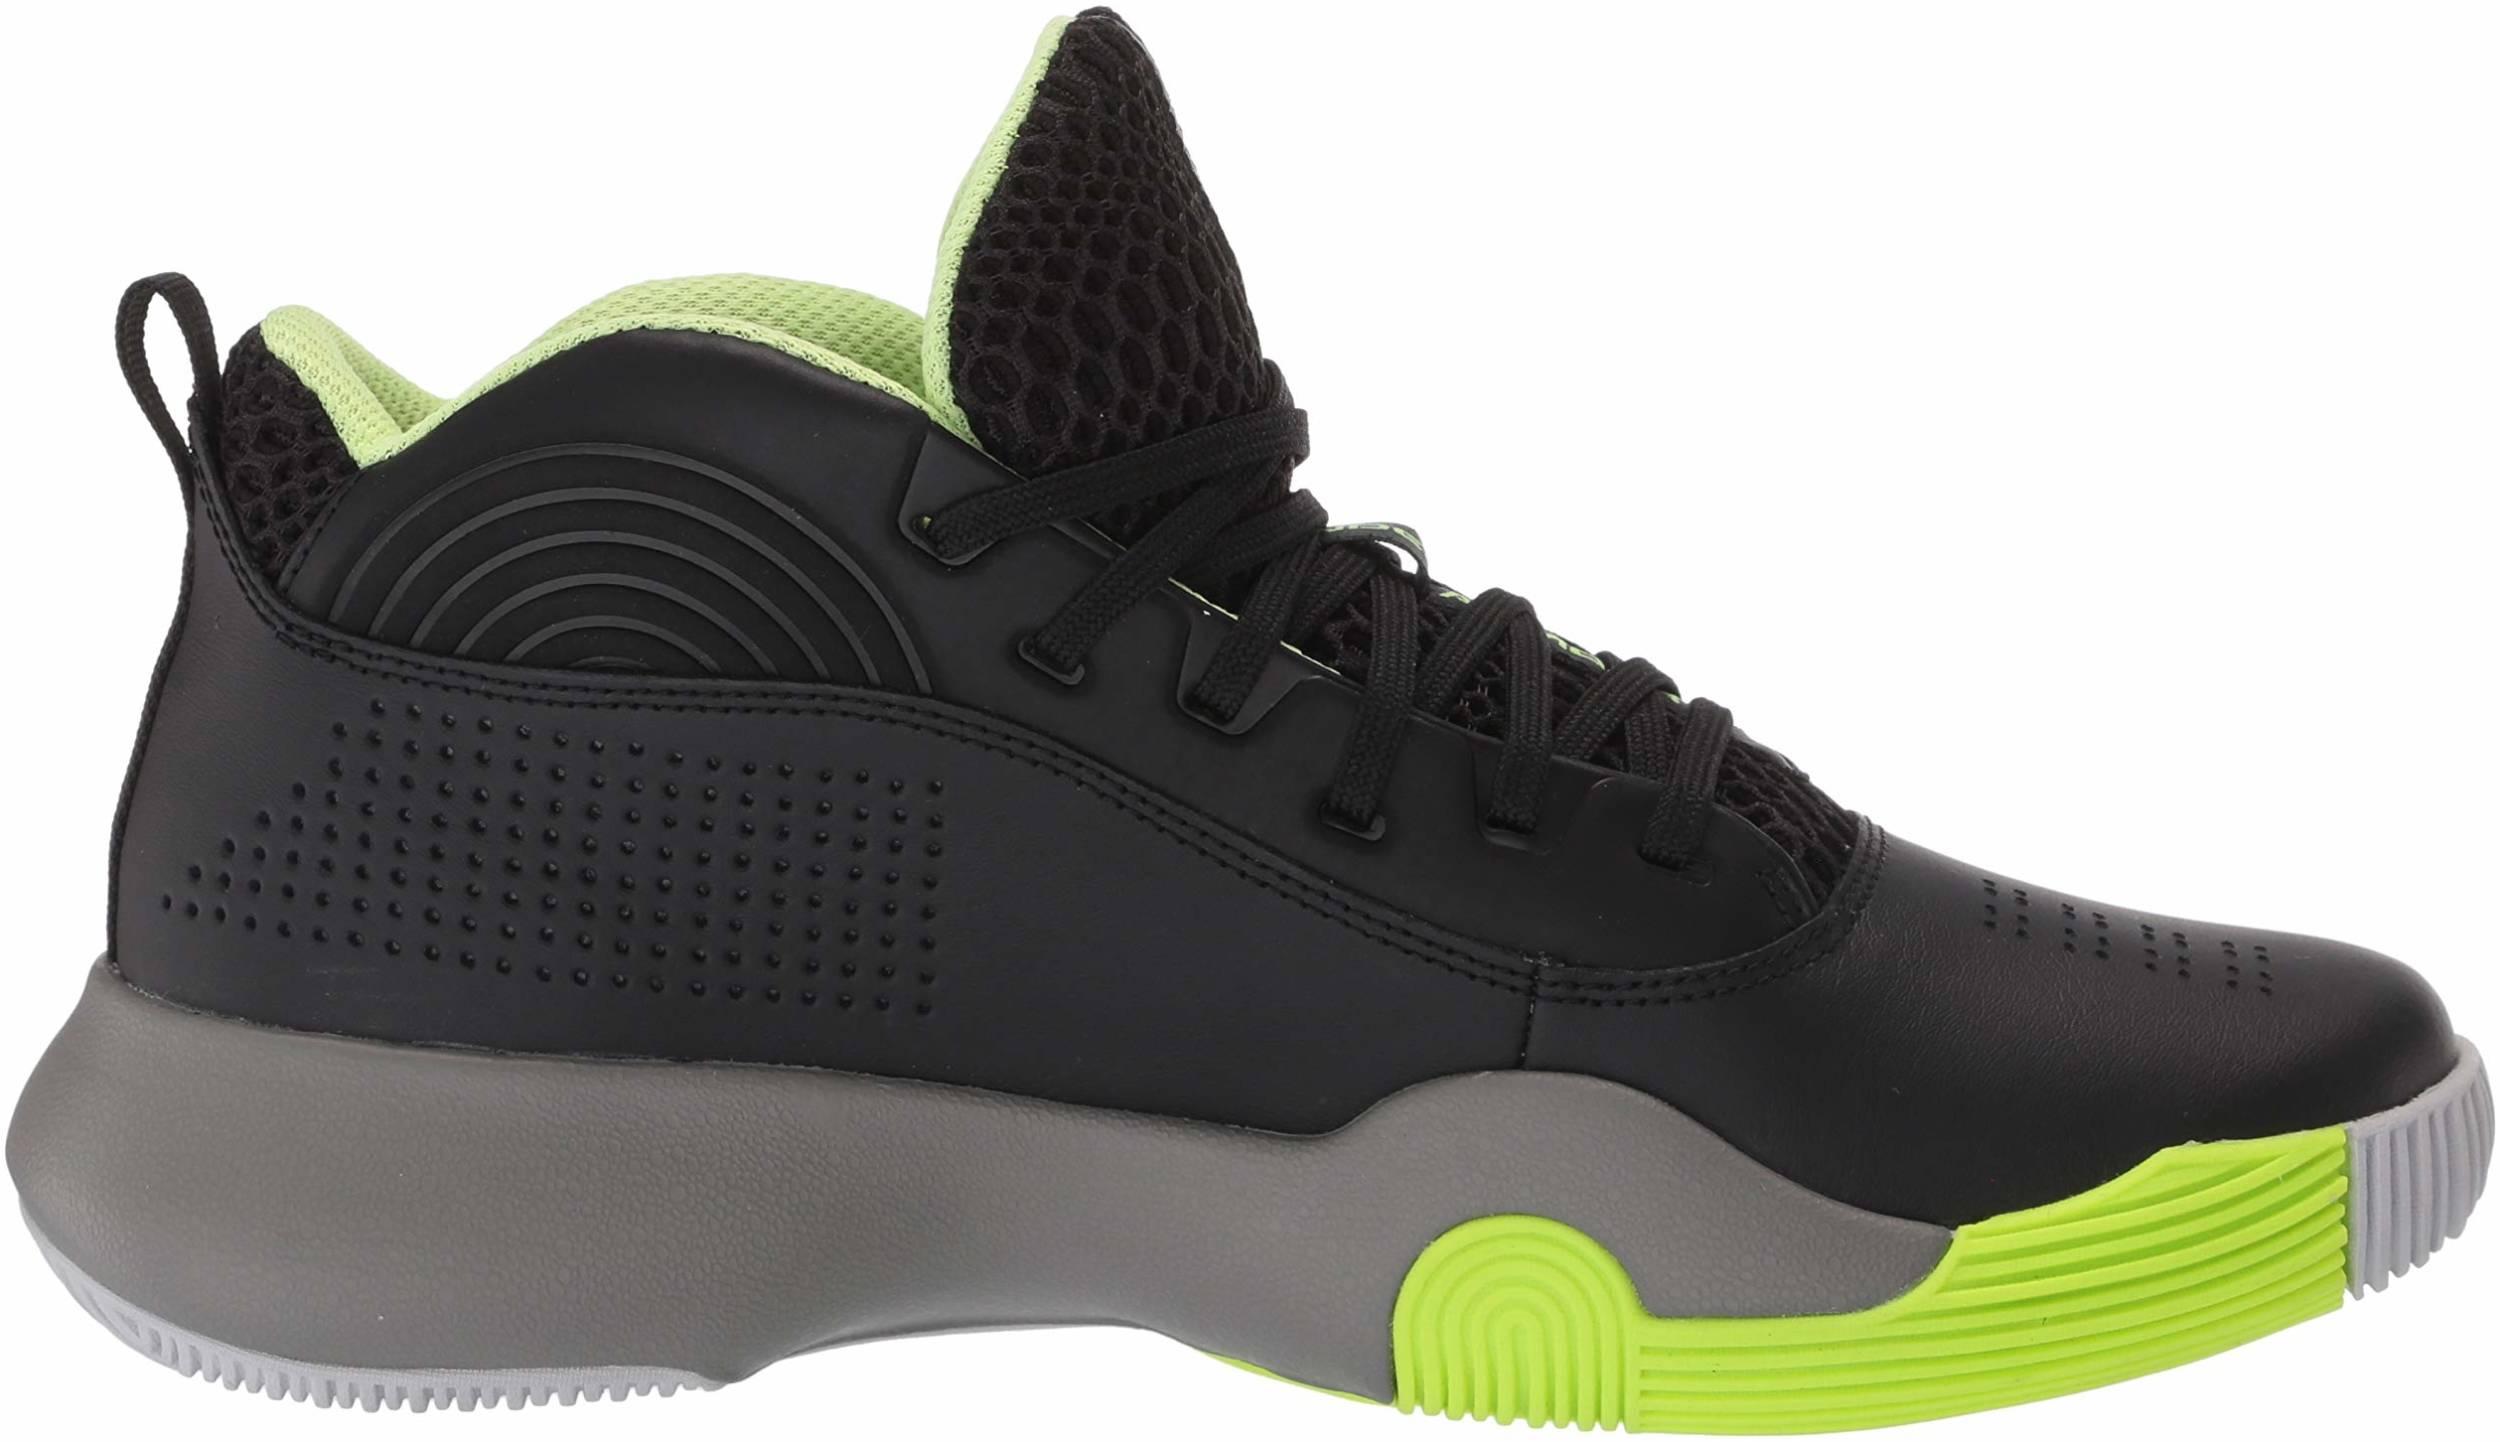 Under Armour UA Lockdown 4 Chaussures de Basketball Homme